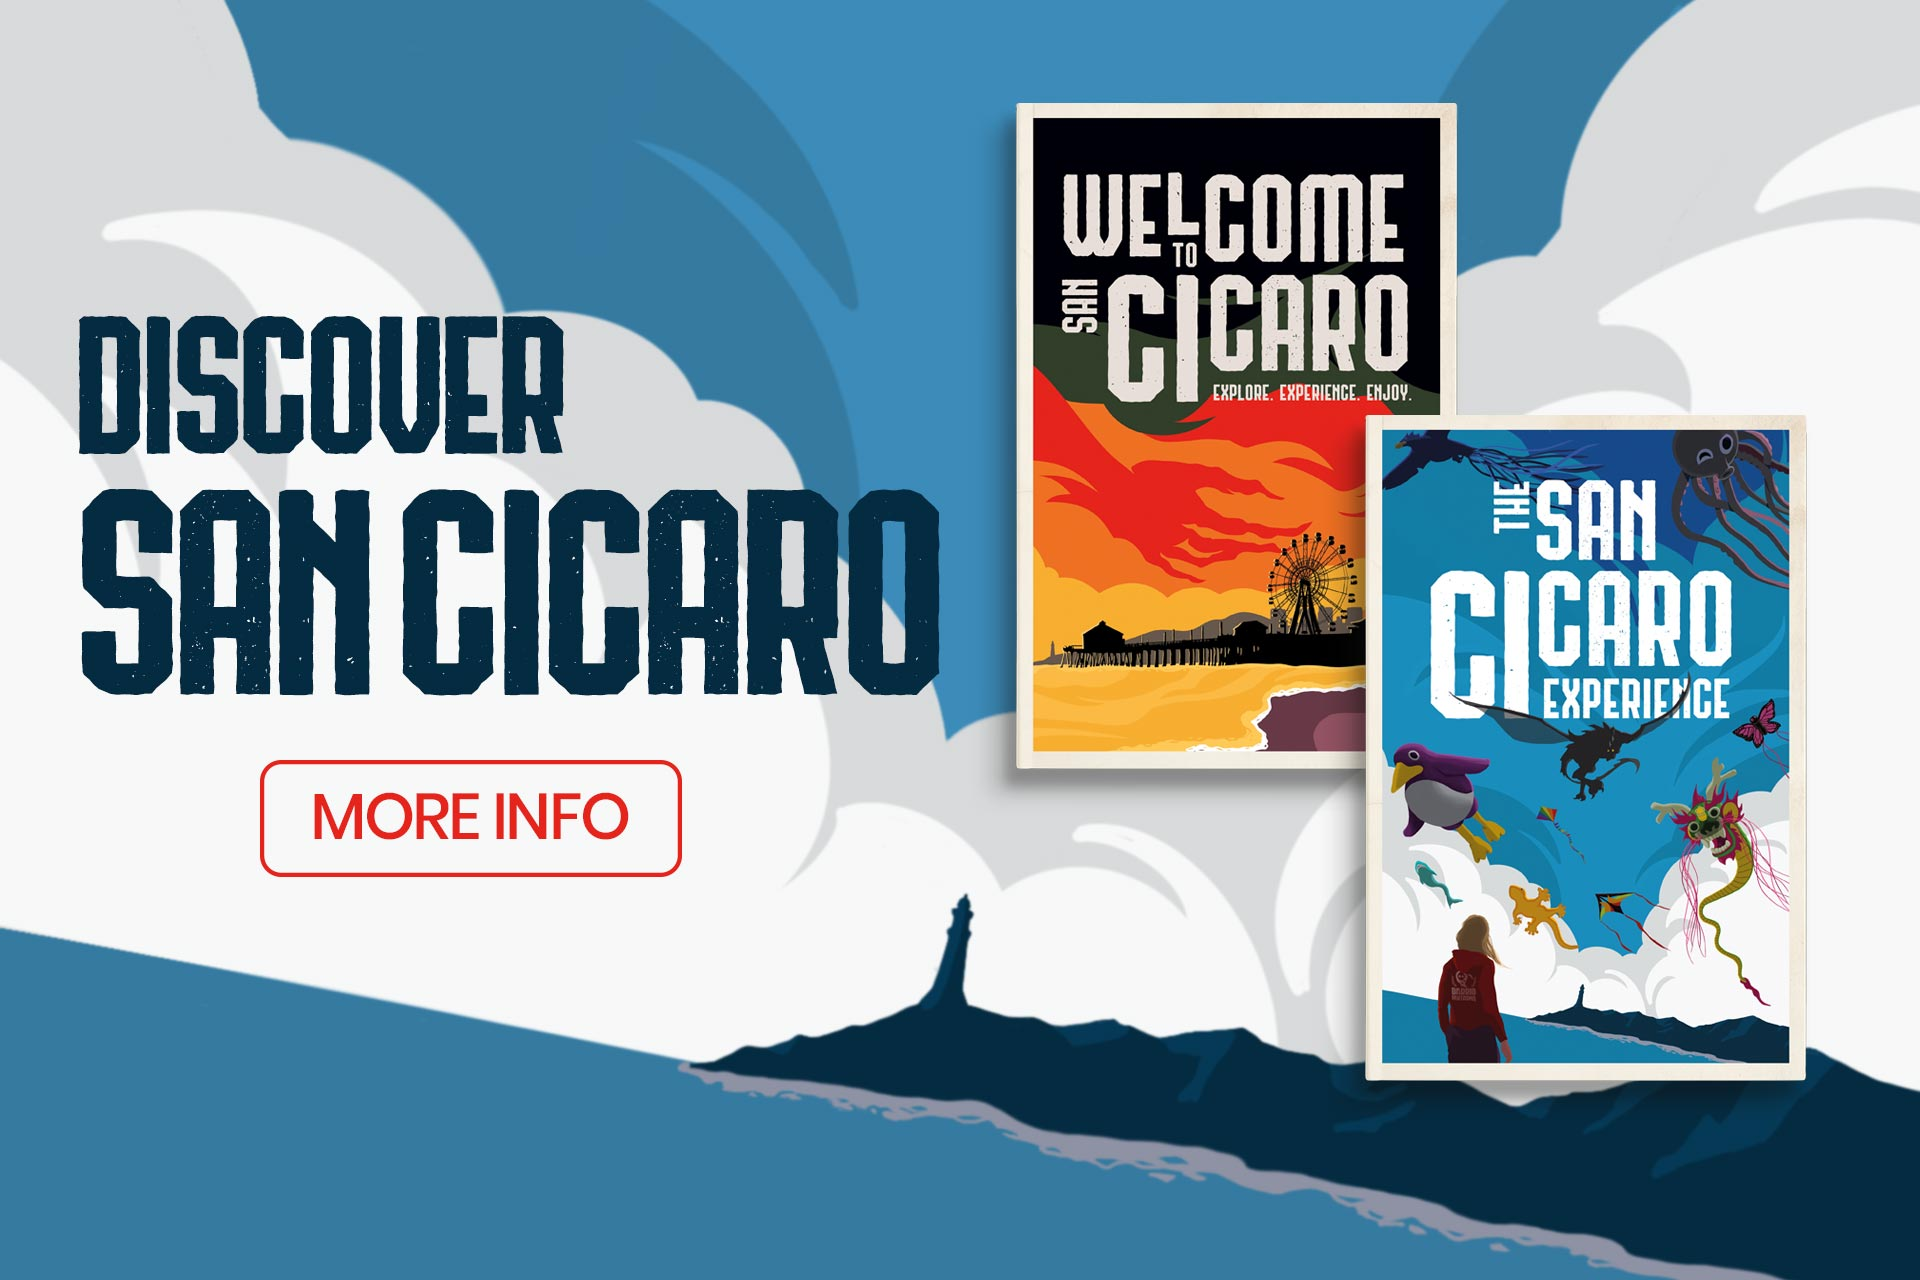 San Cicaro Books